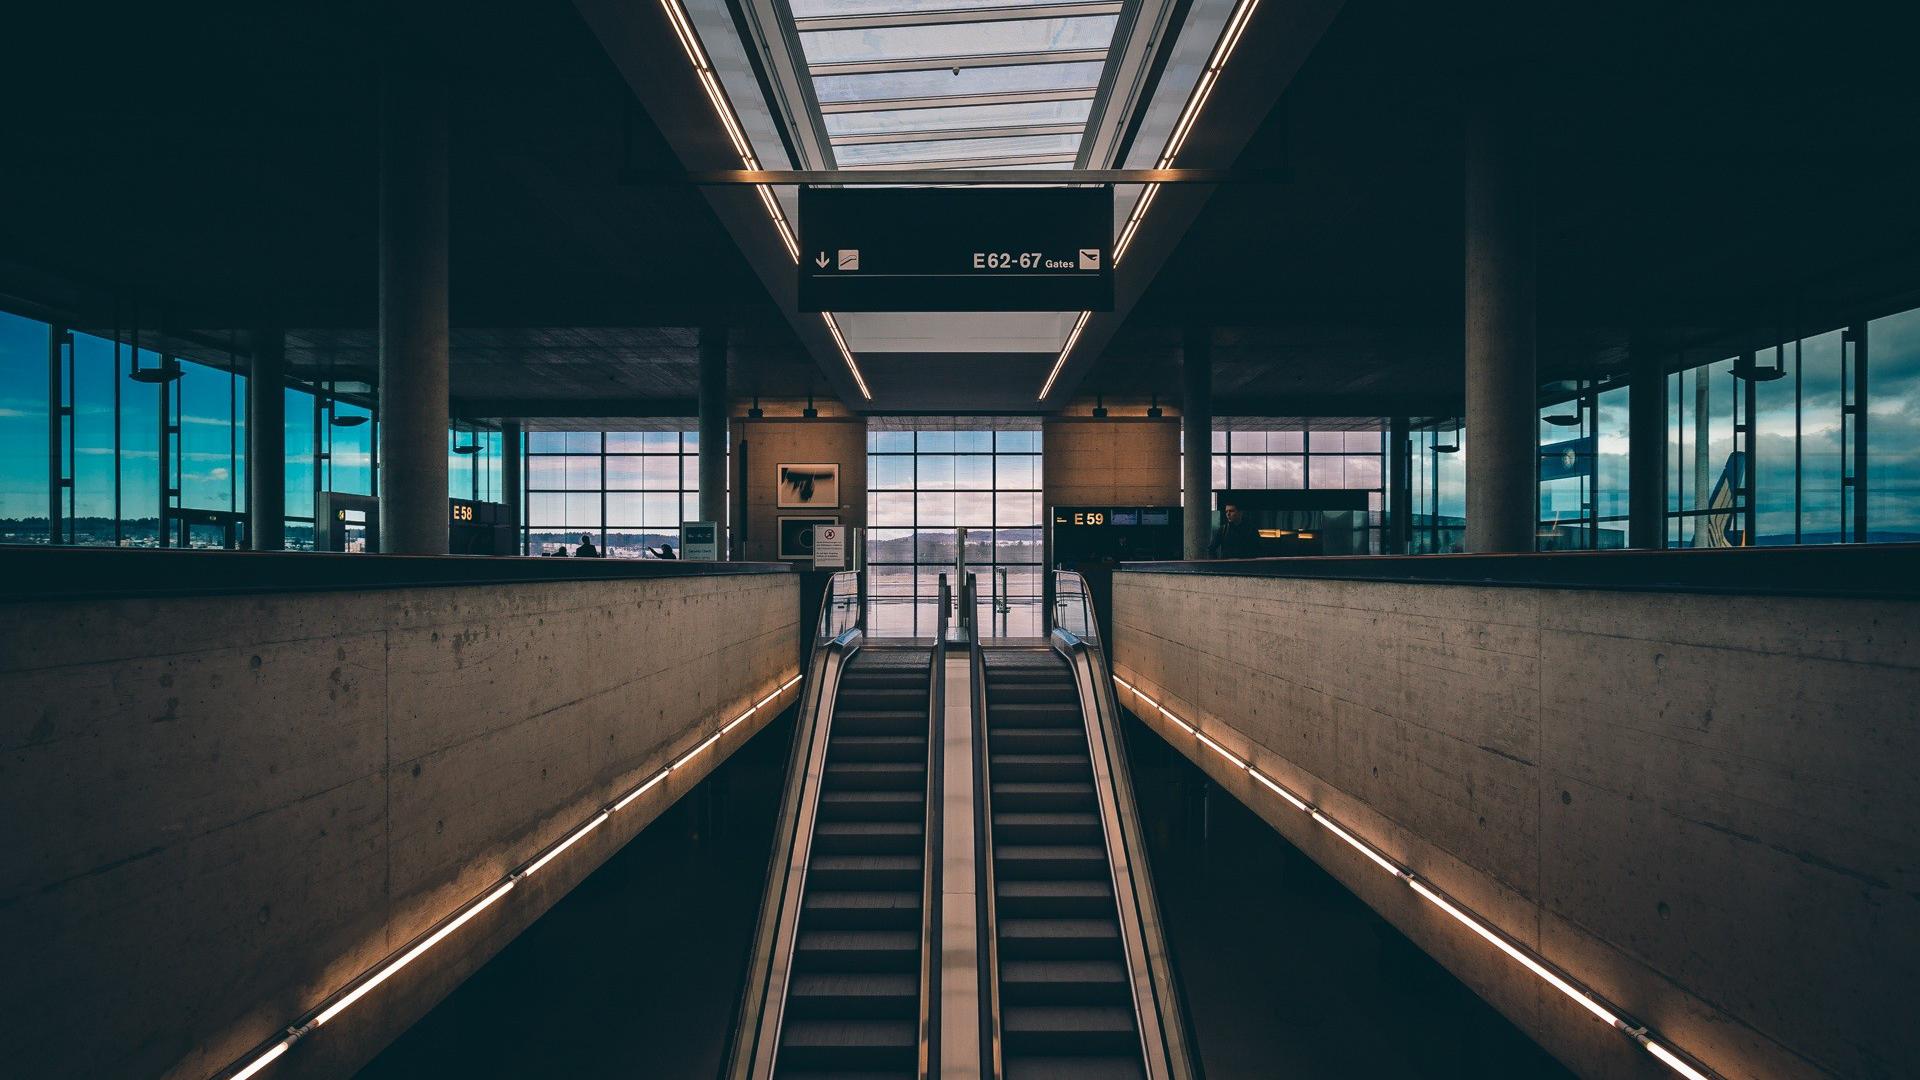 General 1920x1080 escalator airport building numbers